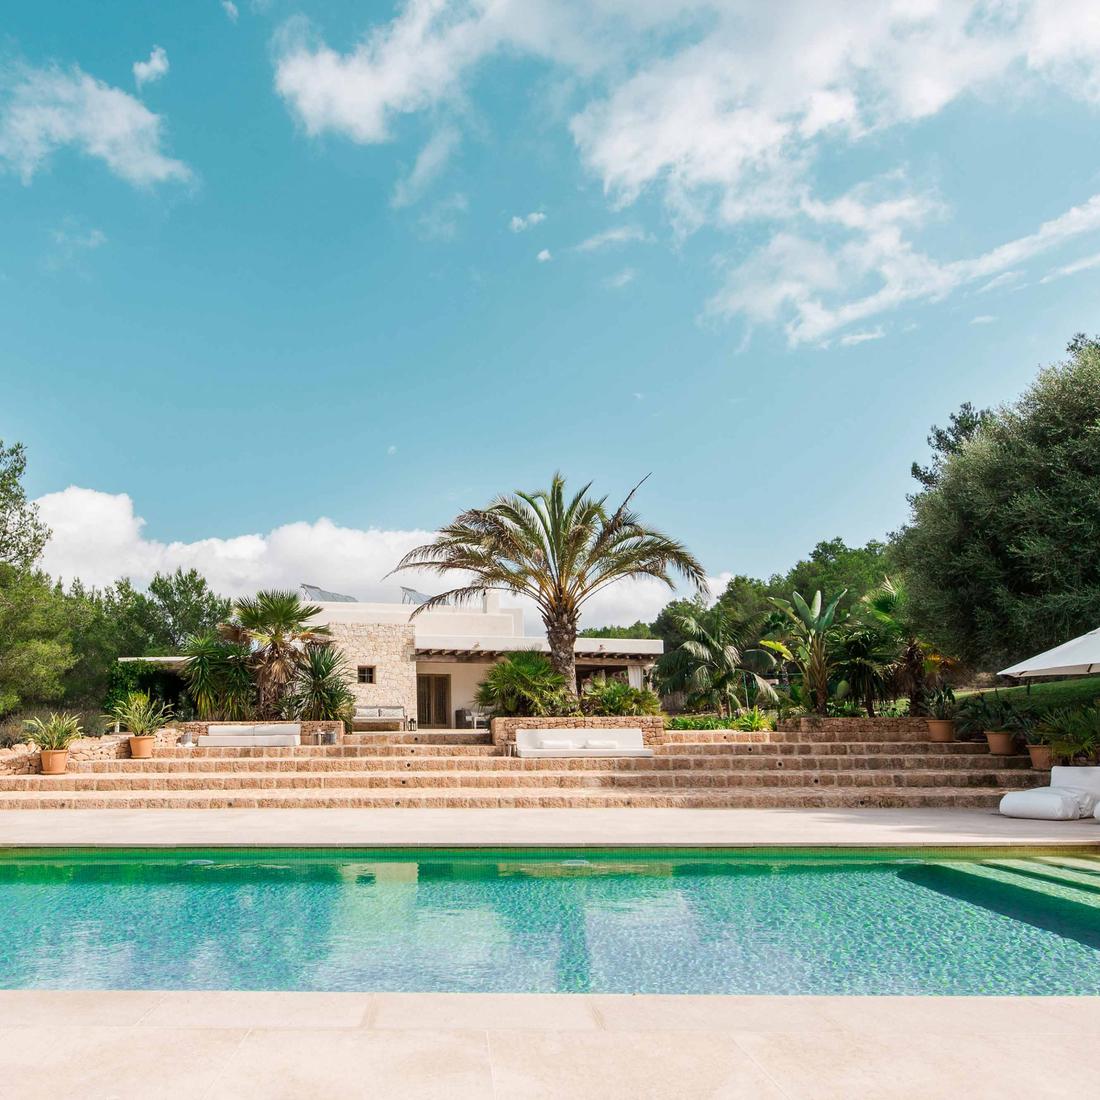 villa holidays spain july 2020  kinder ausmalbilder